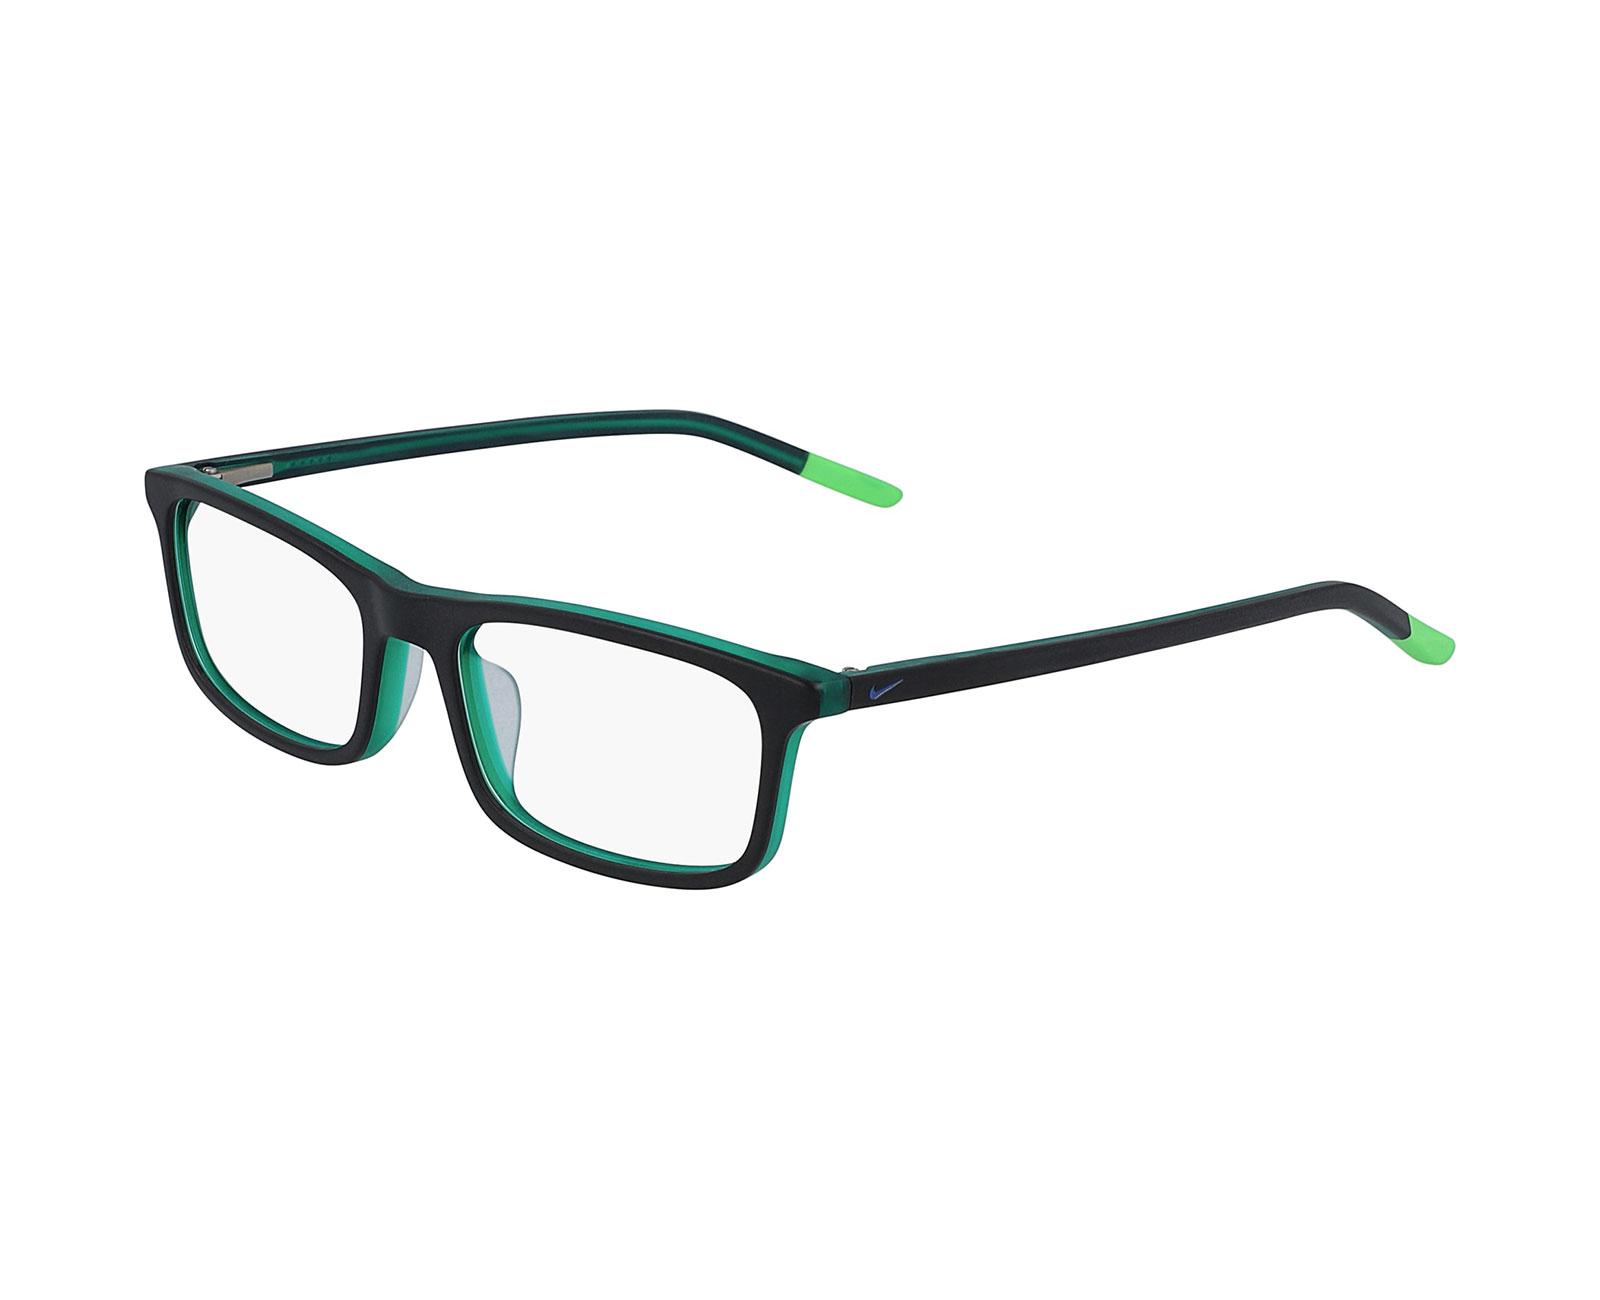 Nike 5540 in Matte Black/Electric Green